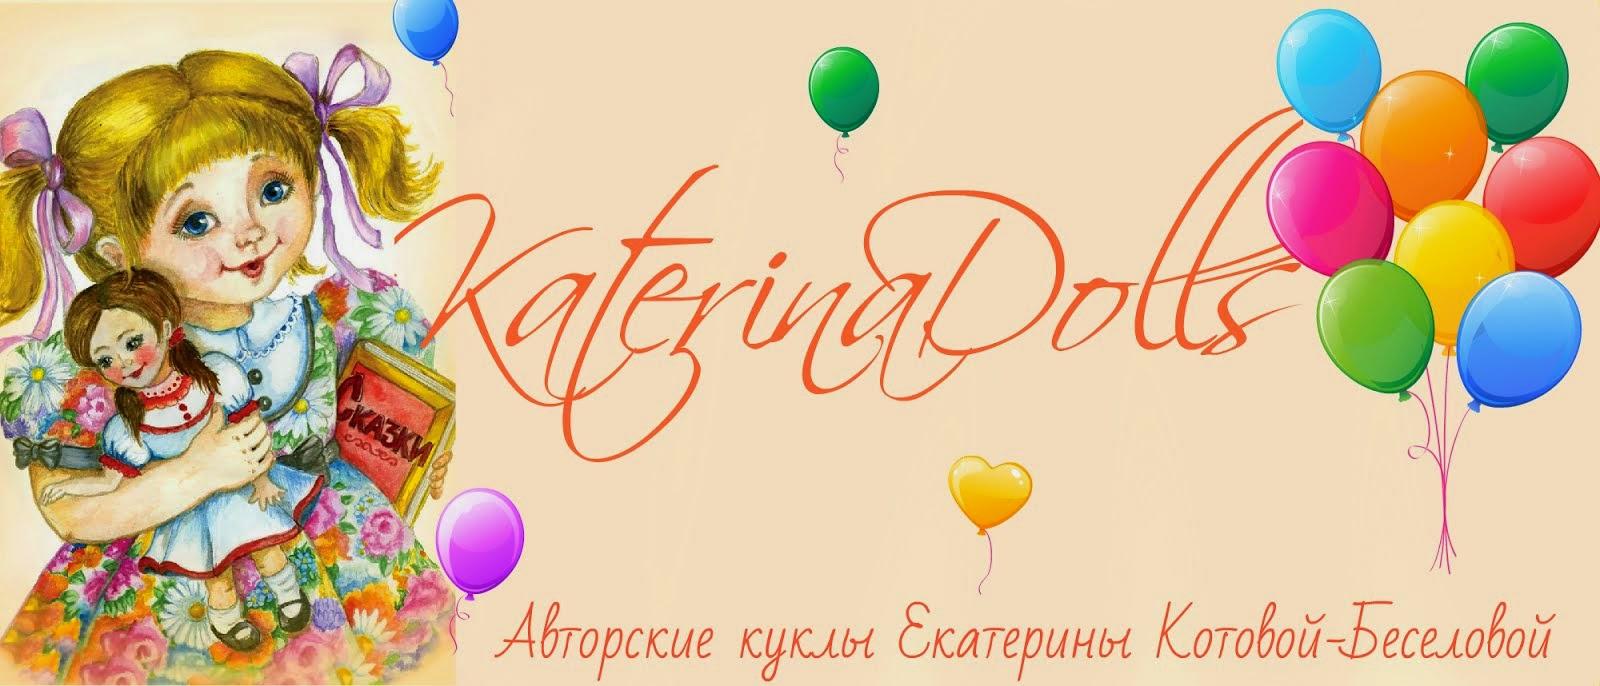 KaterinaDolls